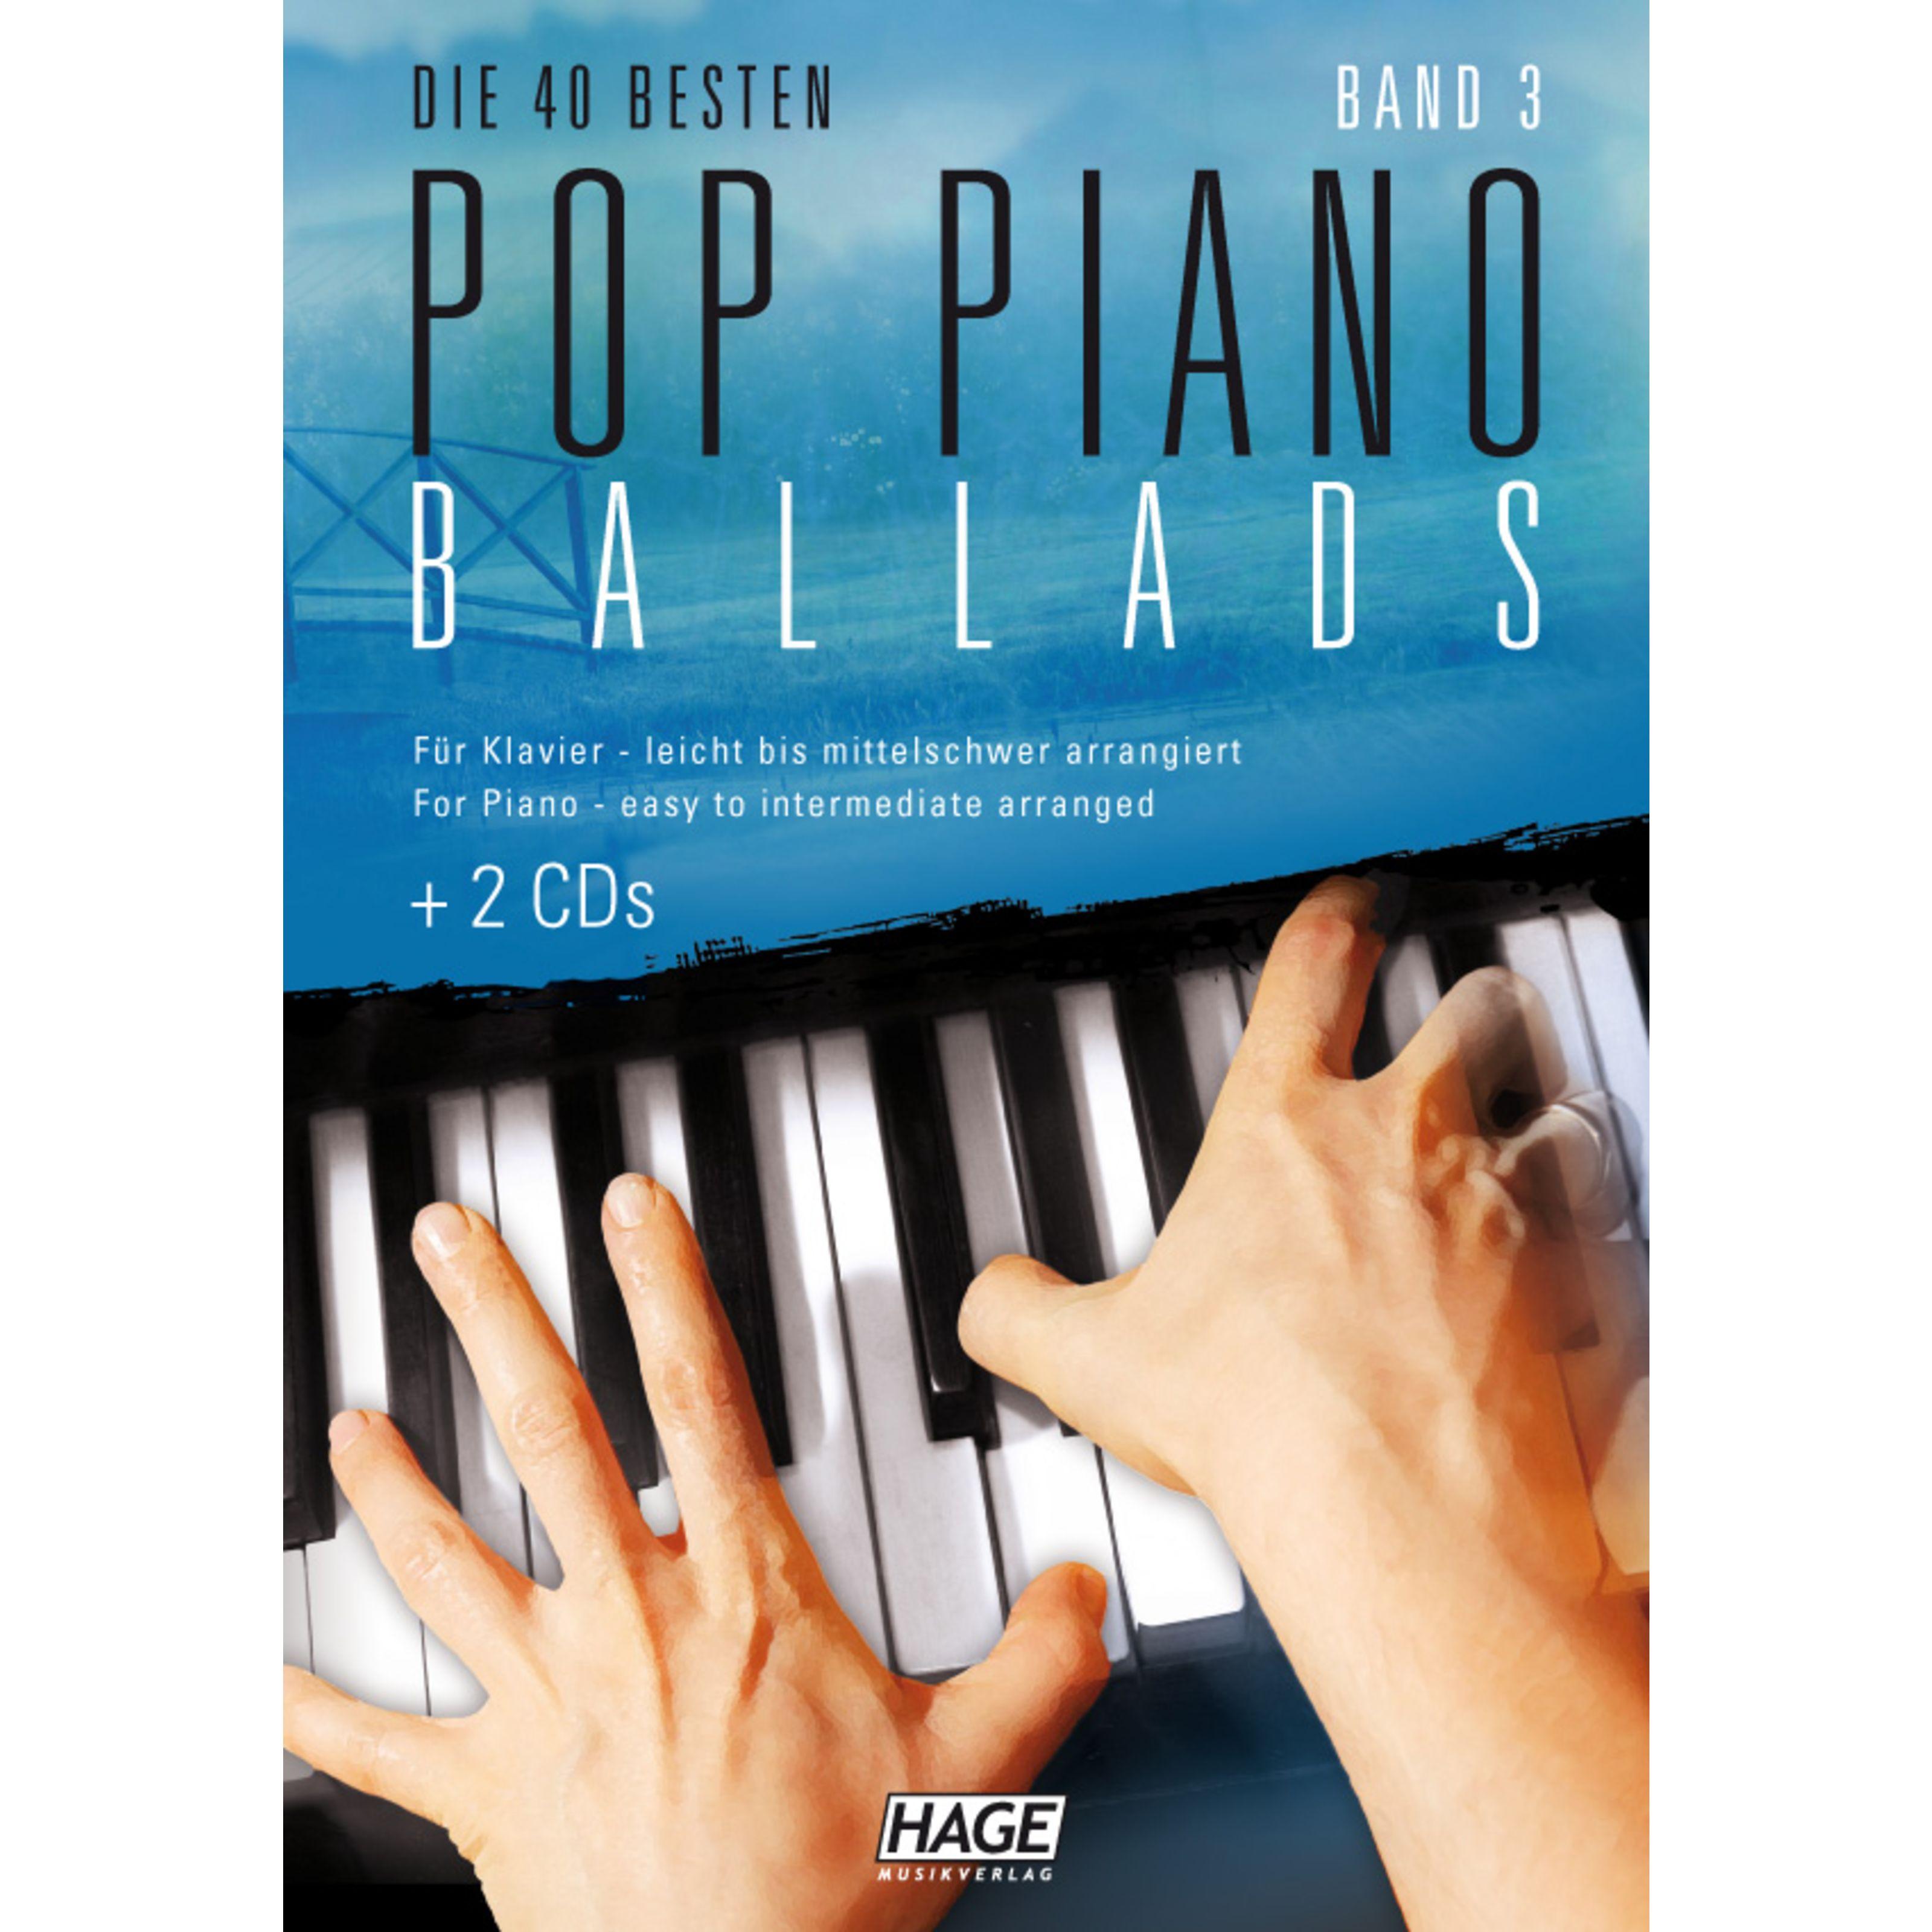 Really Easy Piano 19 Titel leicht Klavier Noten : All-Time Hits leiMittels